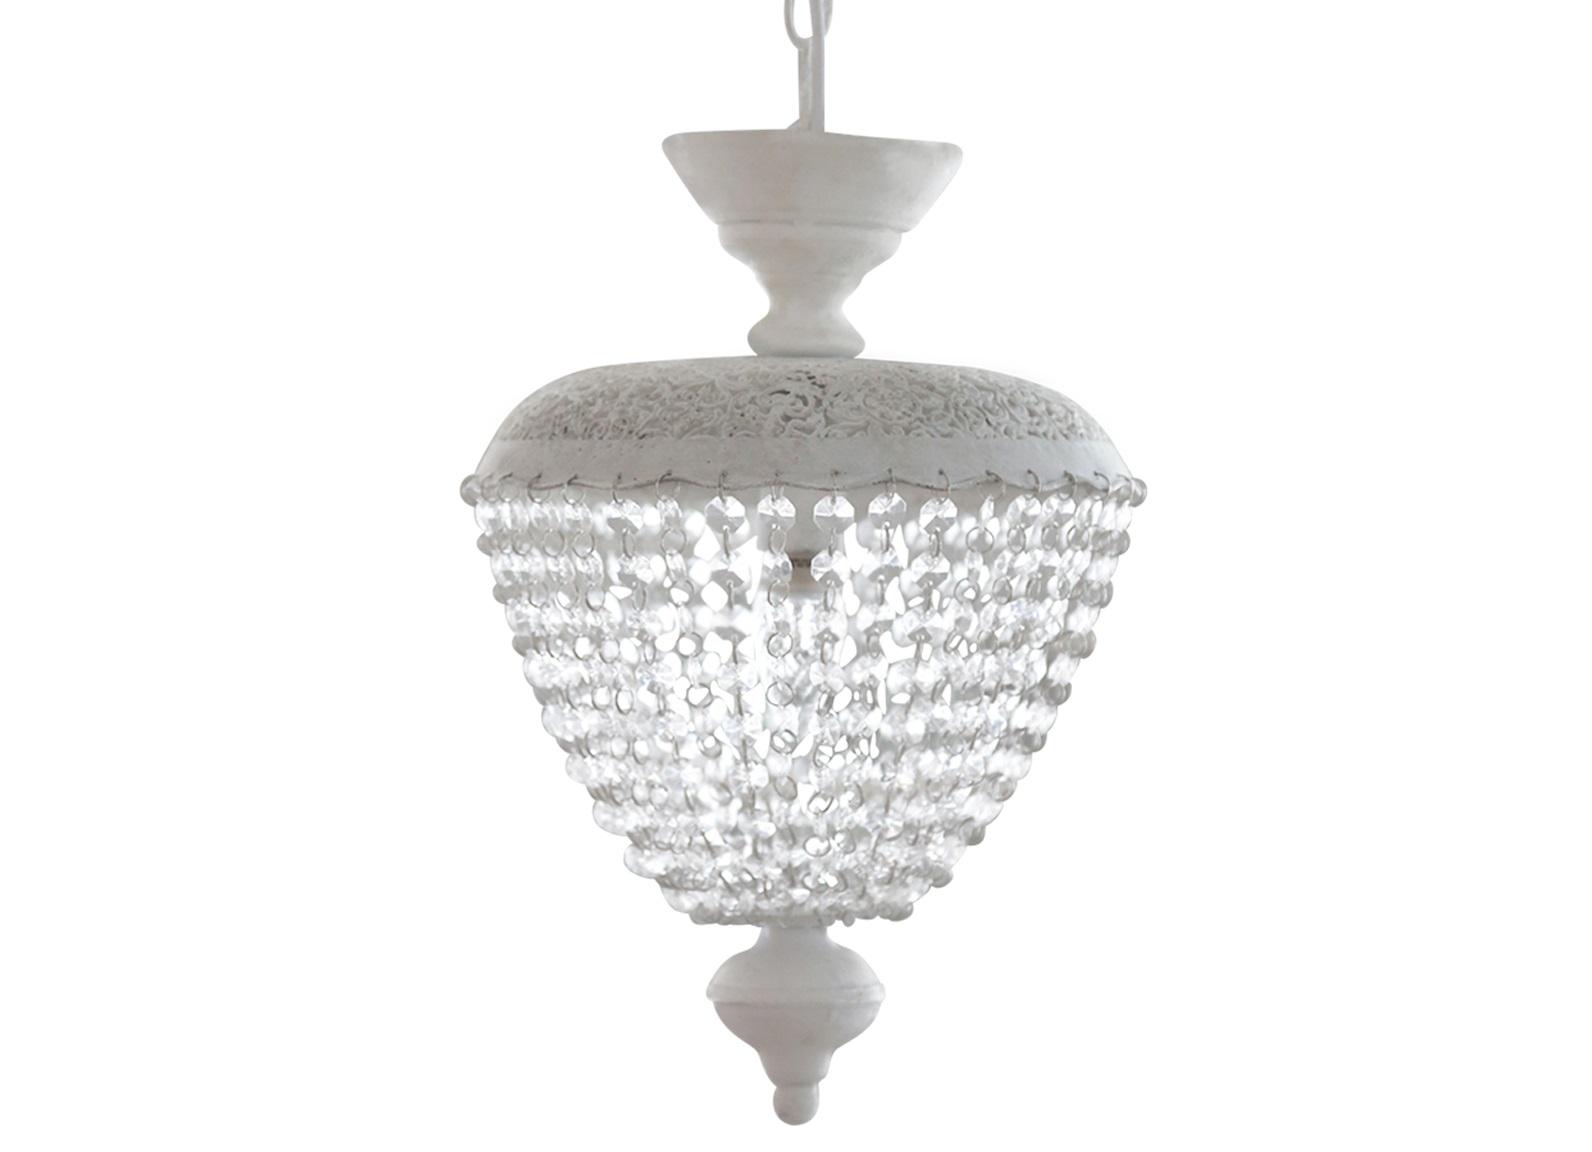 Светильник DiamondПодвесные светильники<br>&amp;lt;div&amp;gt;Вид цоколя: E14&amp;lt;/div&amp;gt;&amp;lt;div&amp;gt;Мощность: 60W&amp;lt;/div&amp;gt;&amp;lt;div&amp;gt;Количество ламп: 1 (нет в комплекте)&amp;lt;/div&amp;gt;&amp;lt;div&amp;gt;&amp;lt;br&amp;gt;&amp;lt;/div&amp;gt;&amp;lt;div&amp;gt;Материал: металл, стекло&amp;lt;/div&amp;gt;<br><br>Material: Металл<br>Width см: None<br>Depth см: None<br>Height см: 36<br>Diameter см: 26